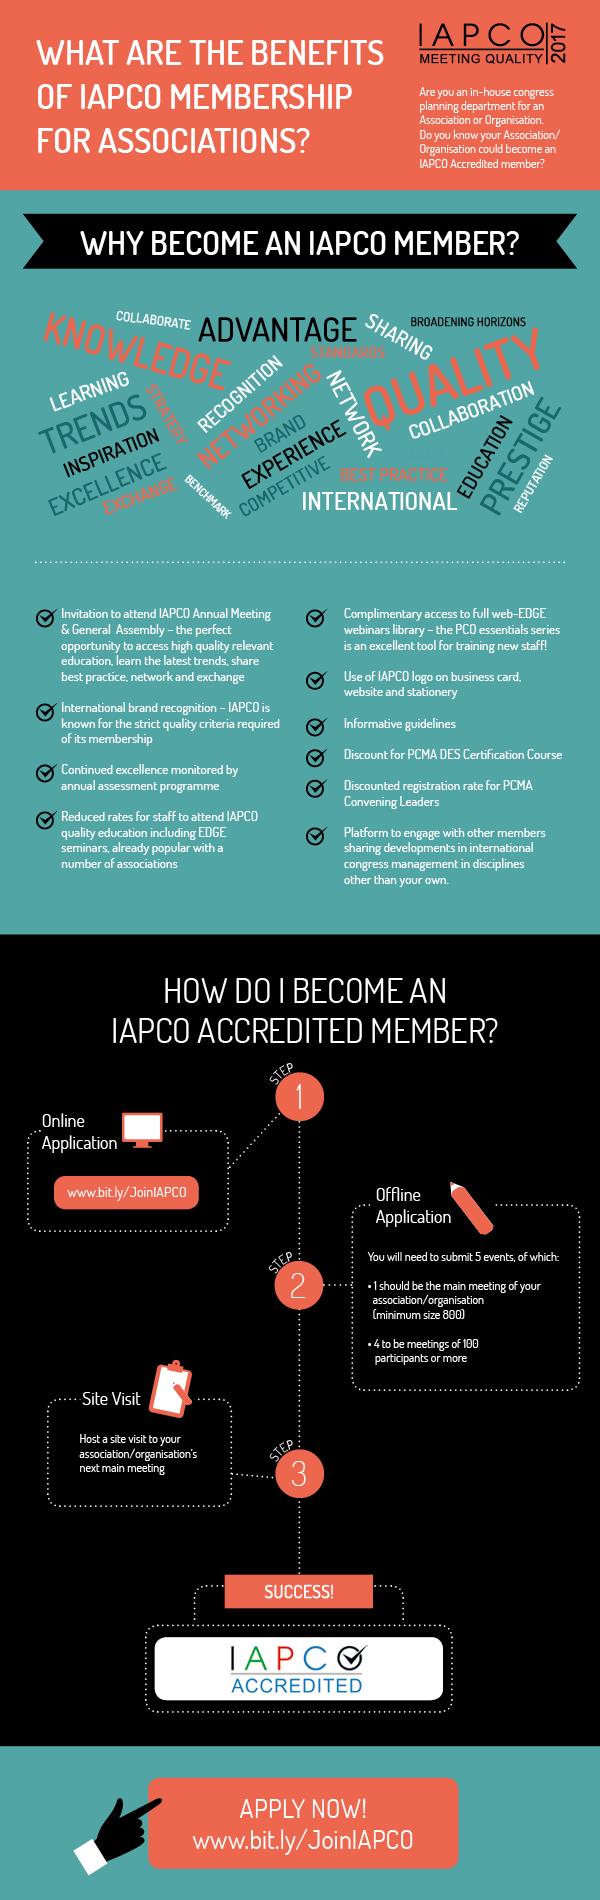 IAPCO membership EDM amend 0111017